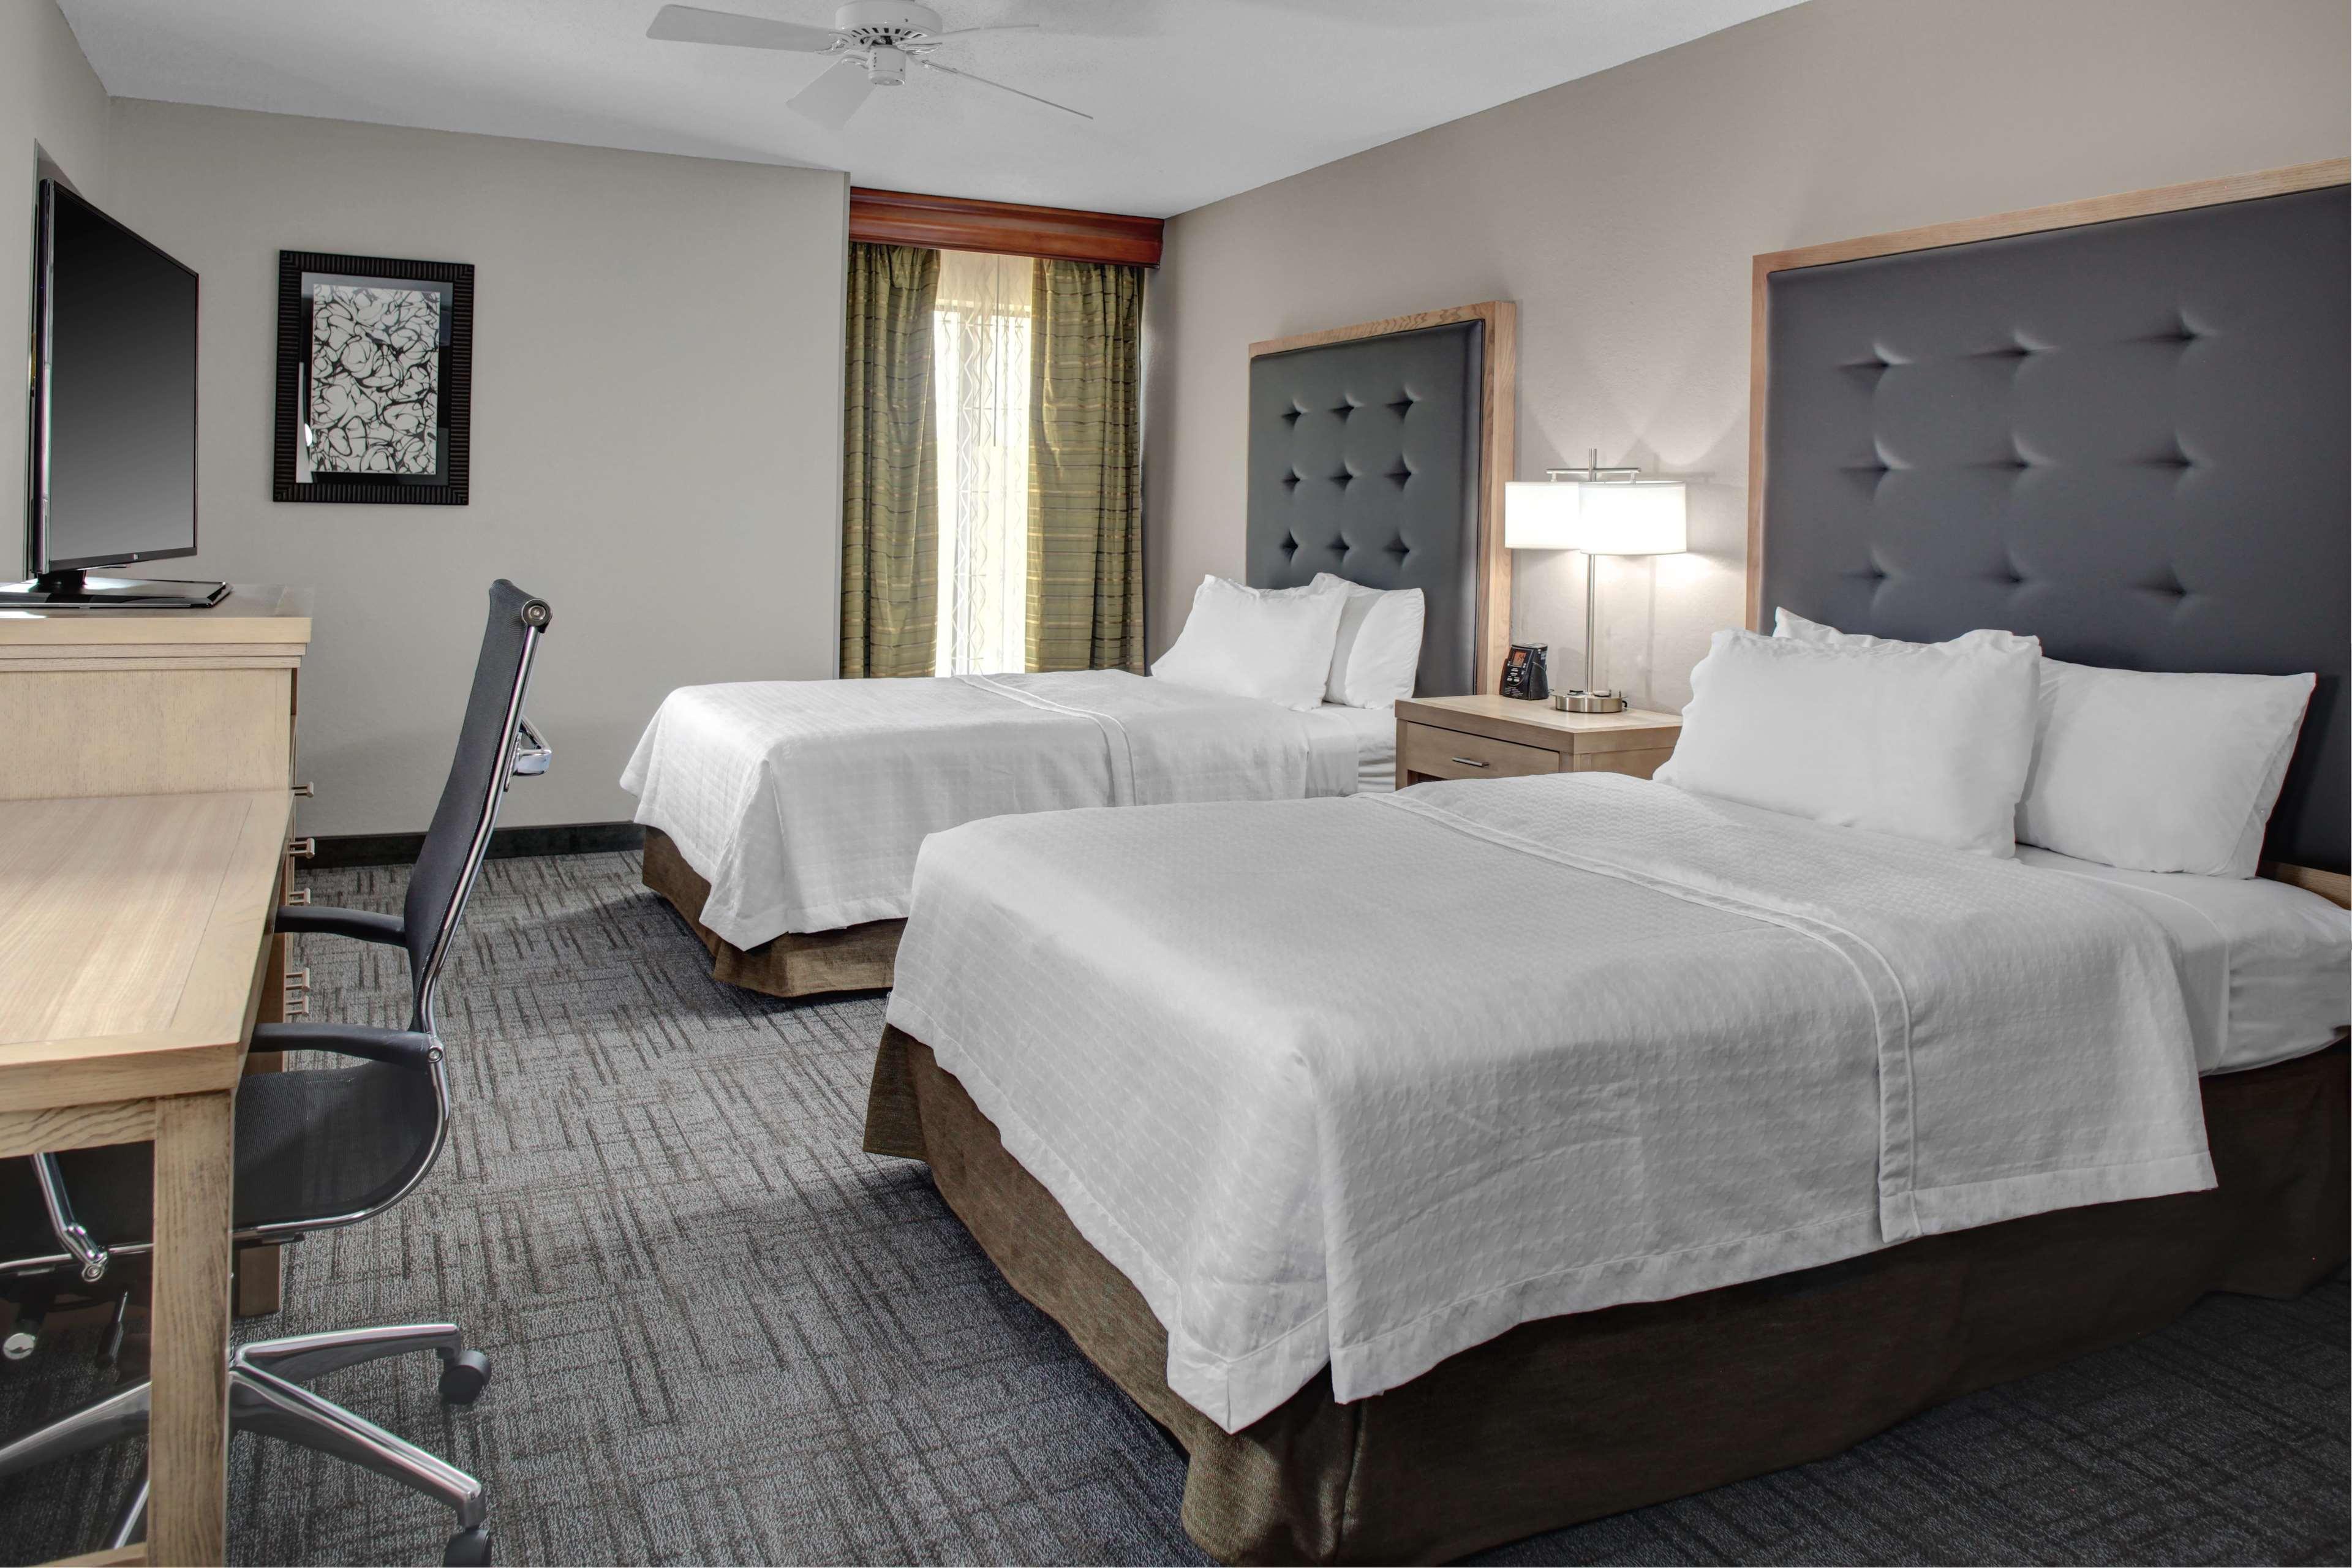 Homewood Suites by Hilton Richmond-West End/Innsbrook image 18